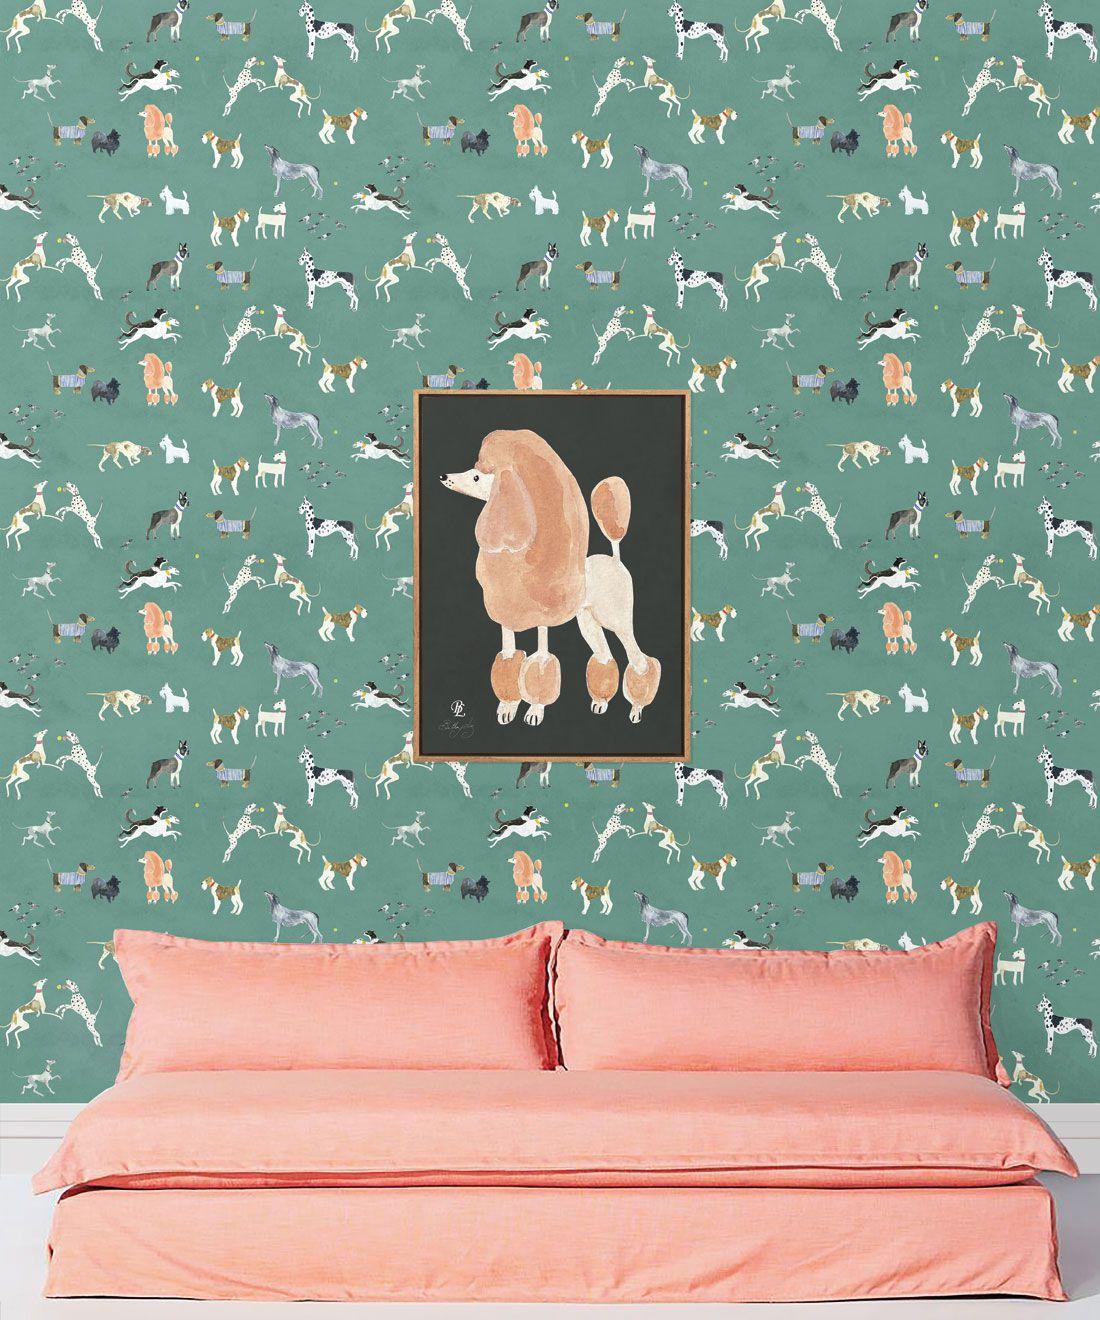 Doggies Wallpaper •Dog Wallpaper •Turquoise • Insitu with sofa